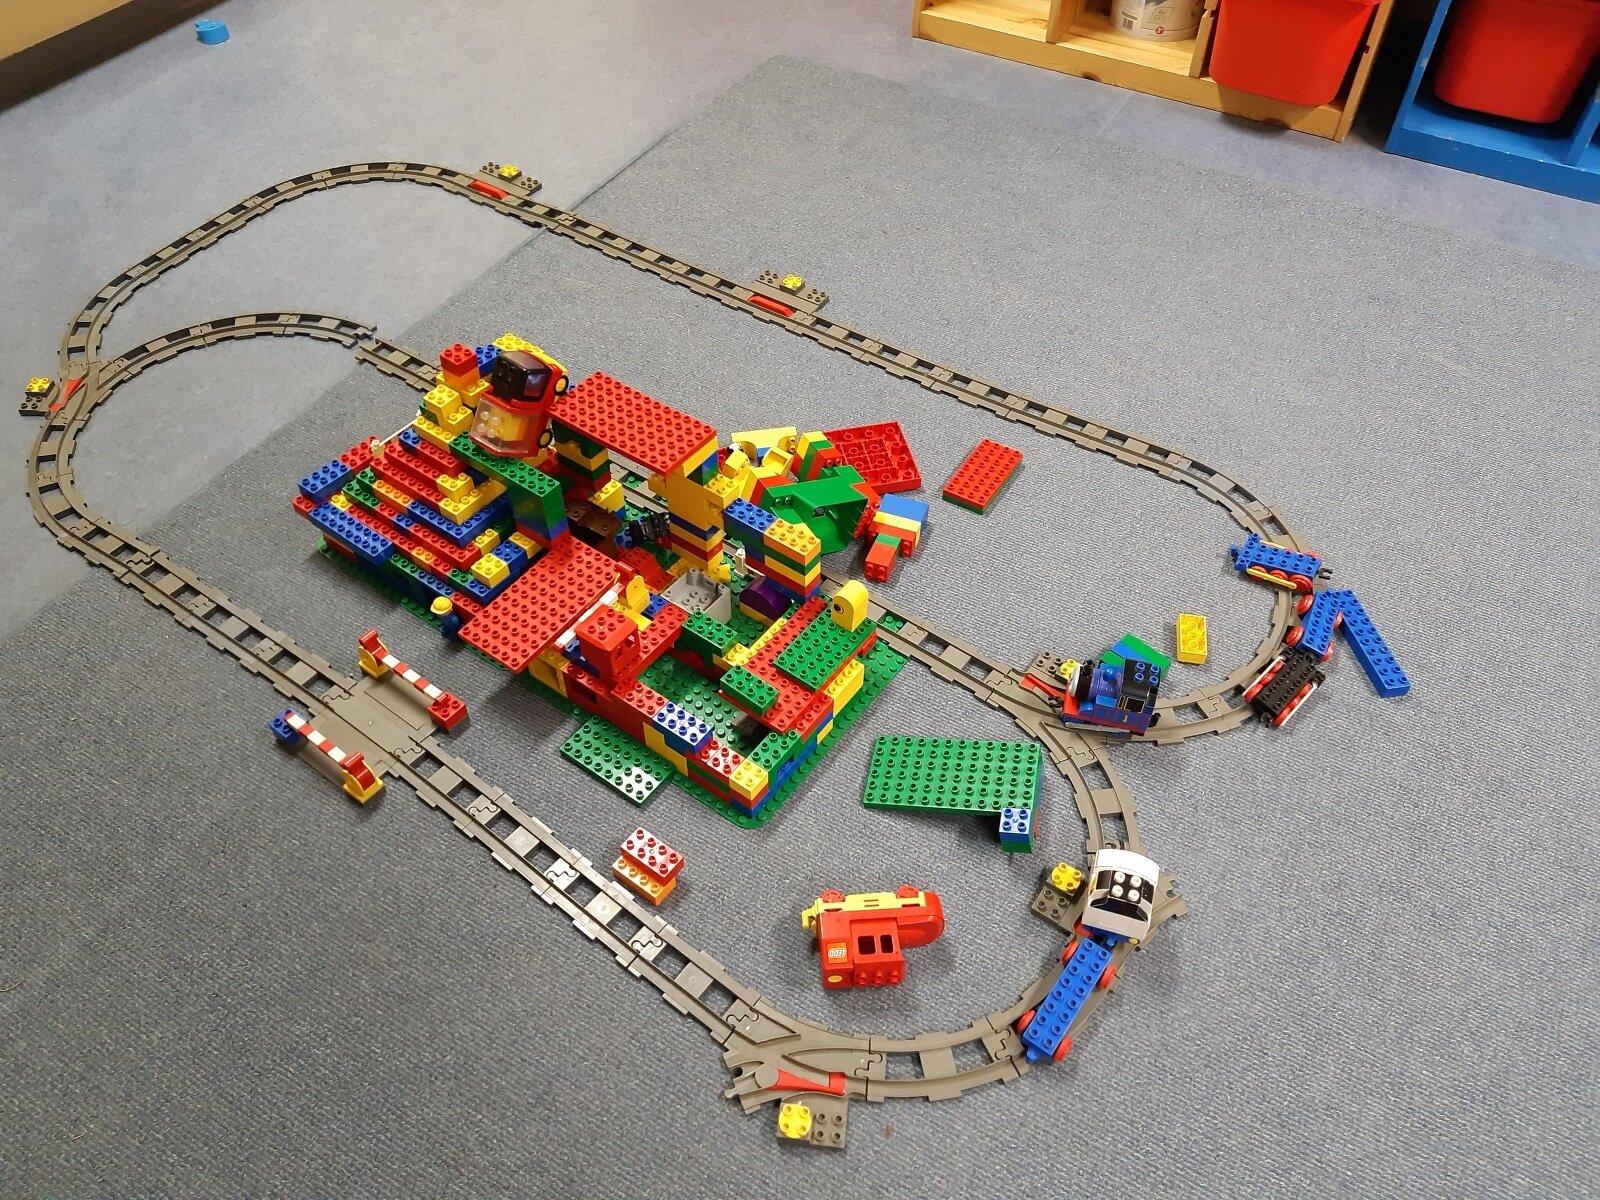 Legobahn